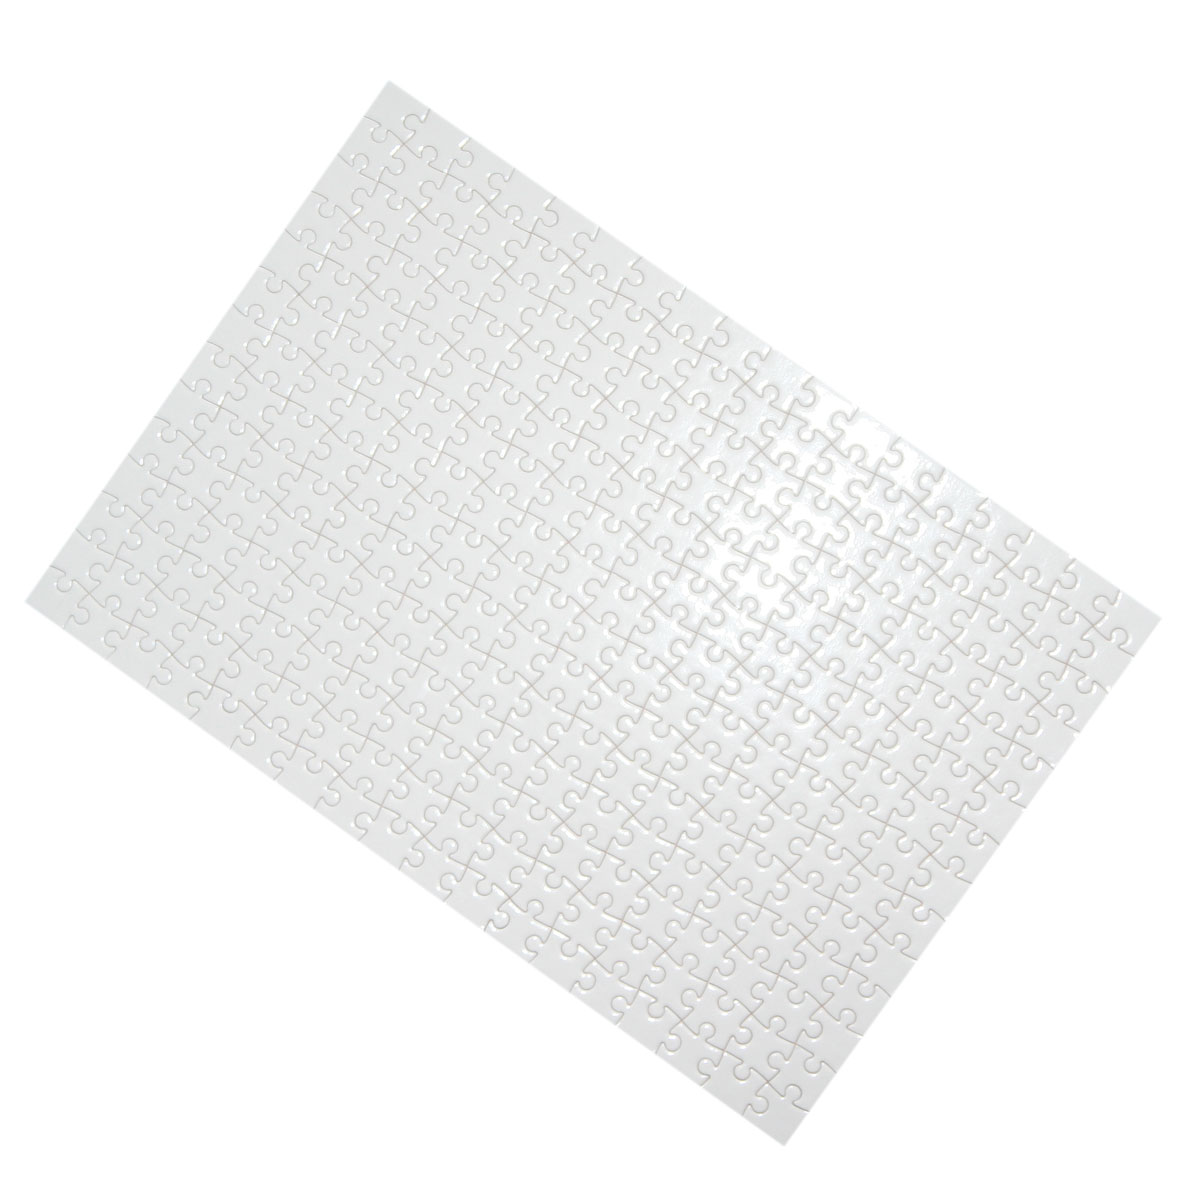 Puzzles for sublimation - 192 elements